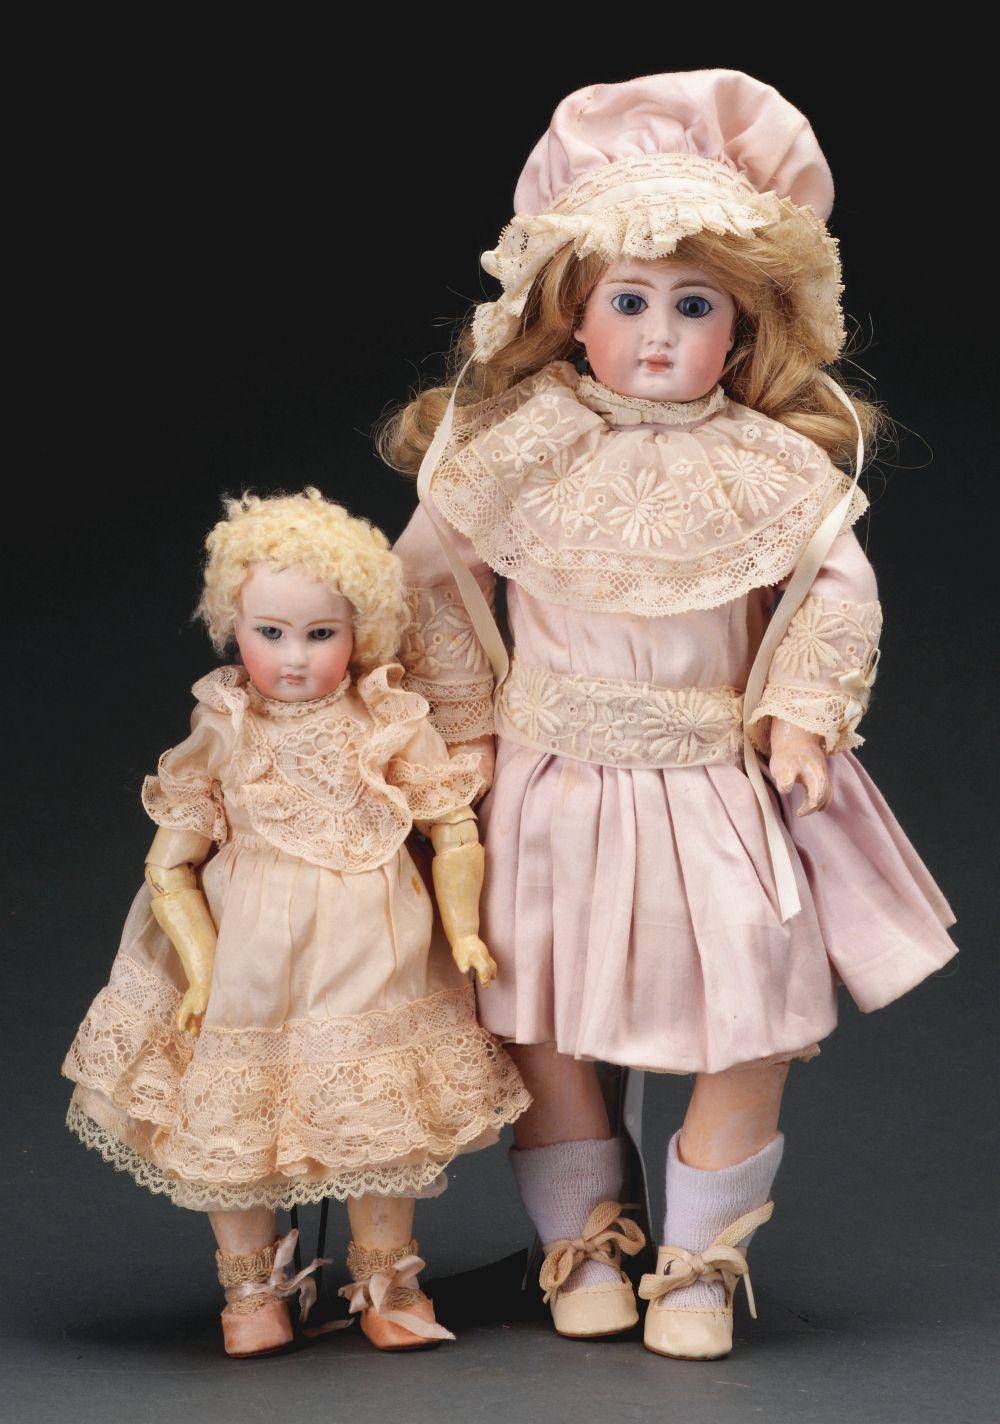 Lot 2072: Lot of 2: Belton-Type Bisque Dolls.